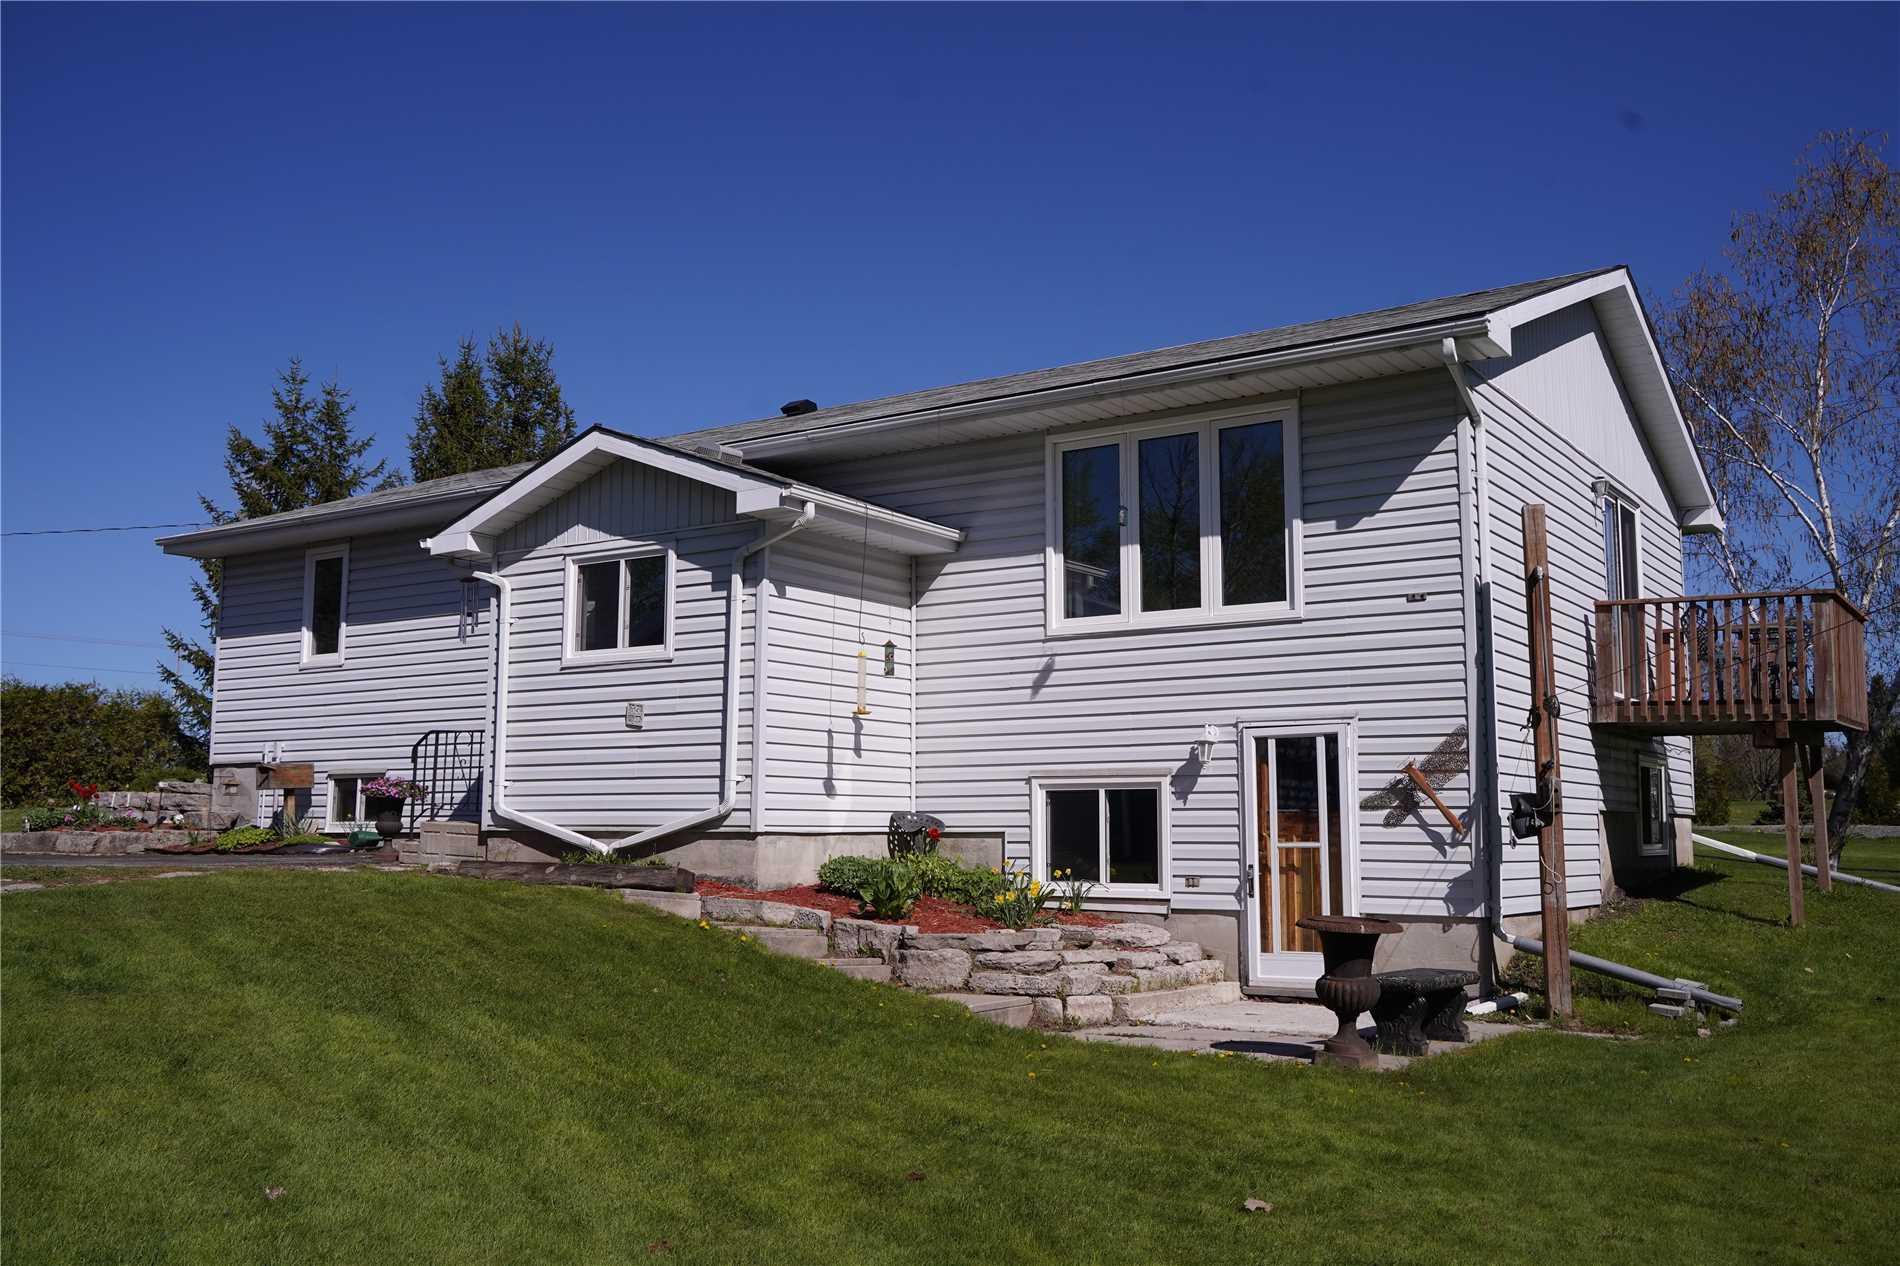 1580 County Rd 46 Rd, Kawartha Lakes, Ontario (ID X4376550)